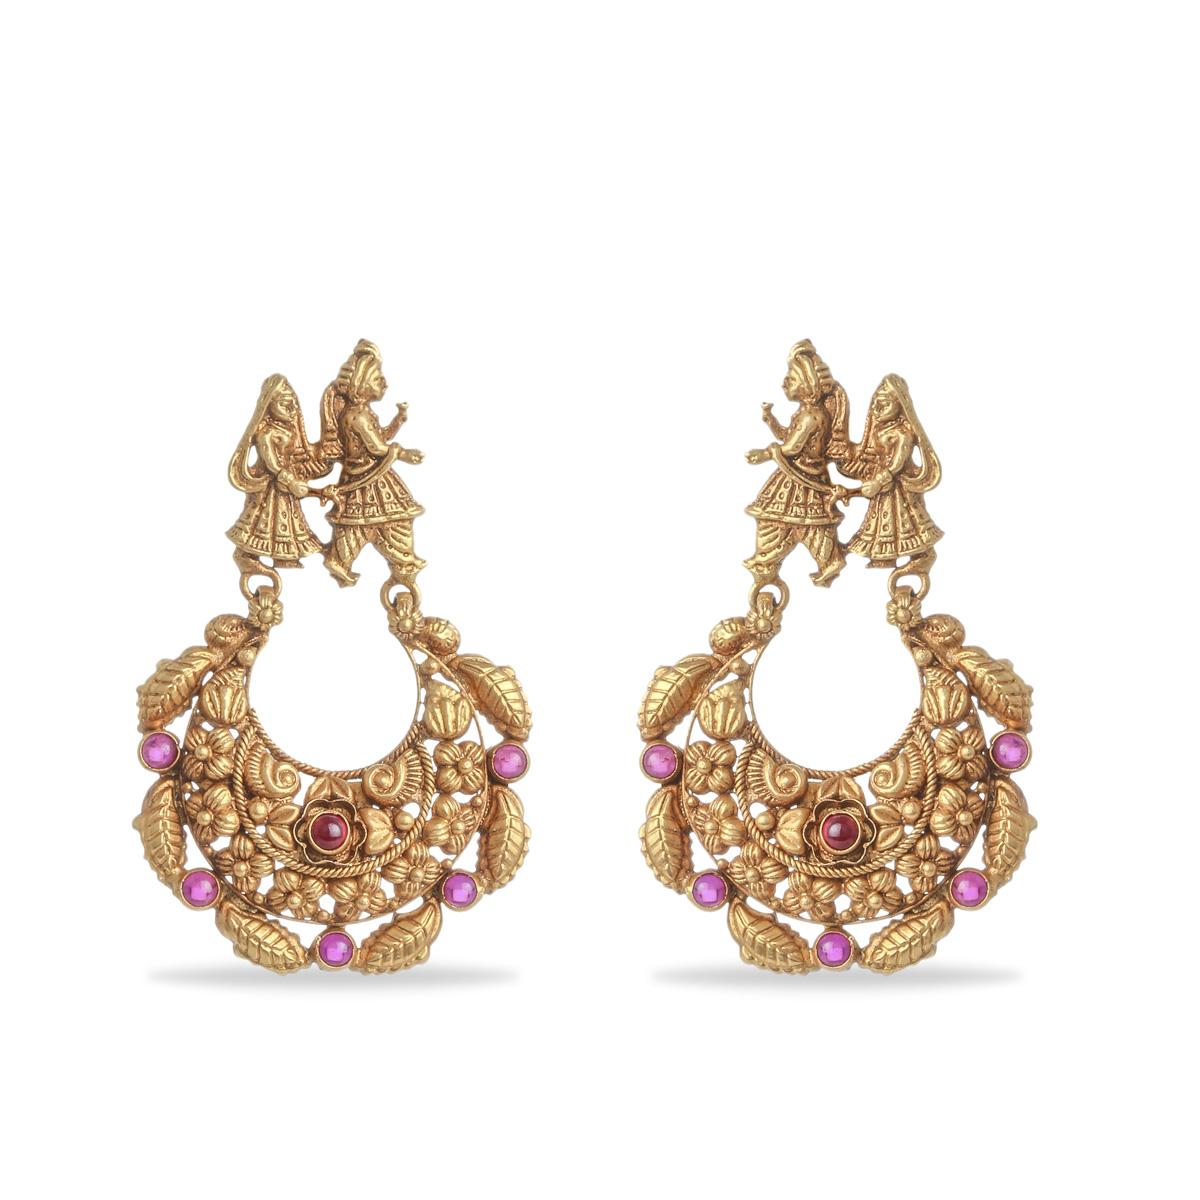 Chandubaali Earrings